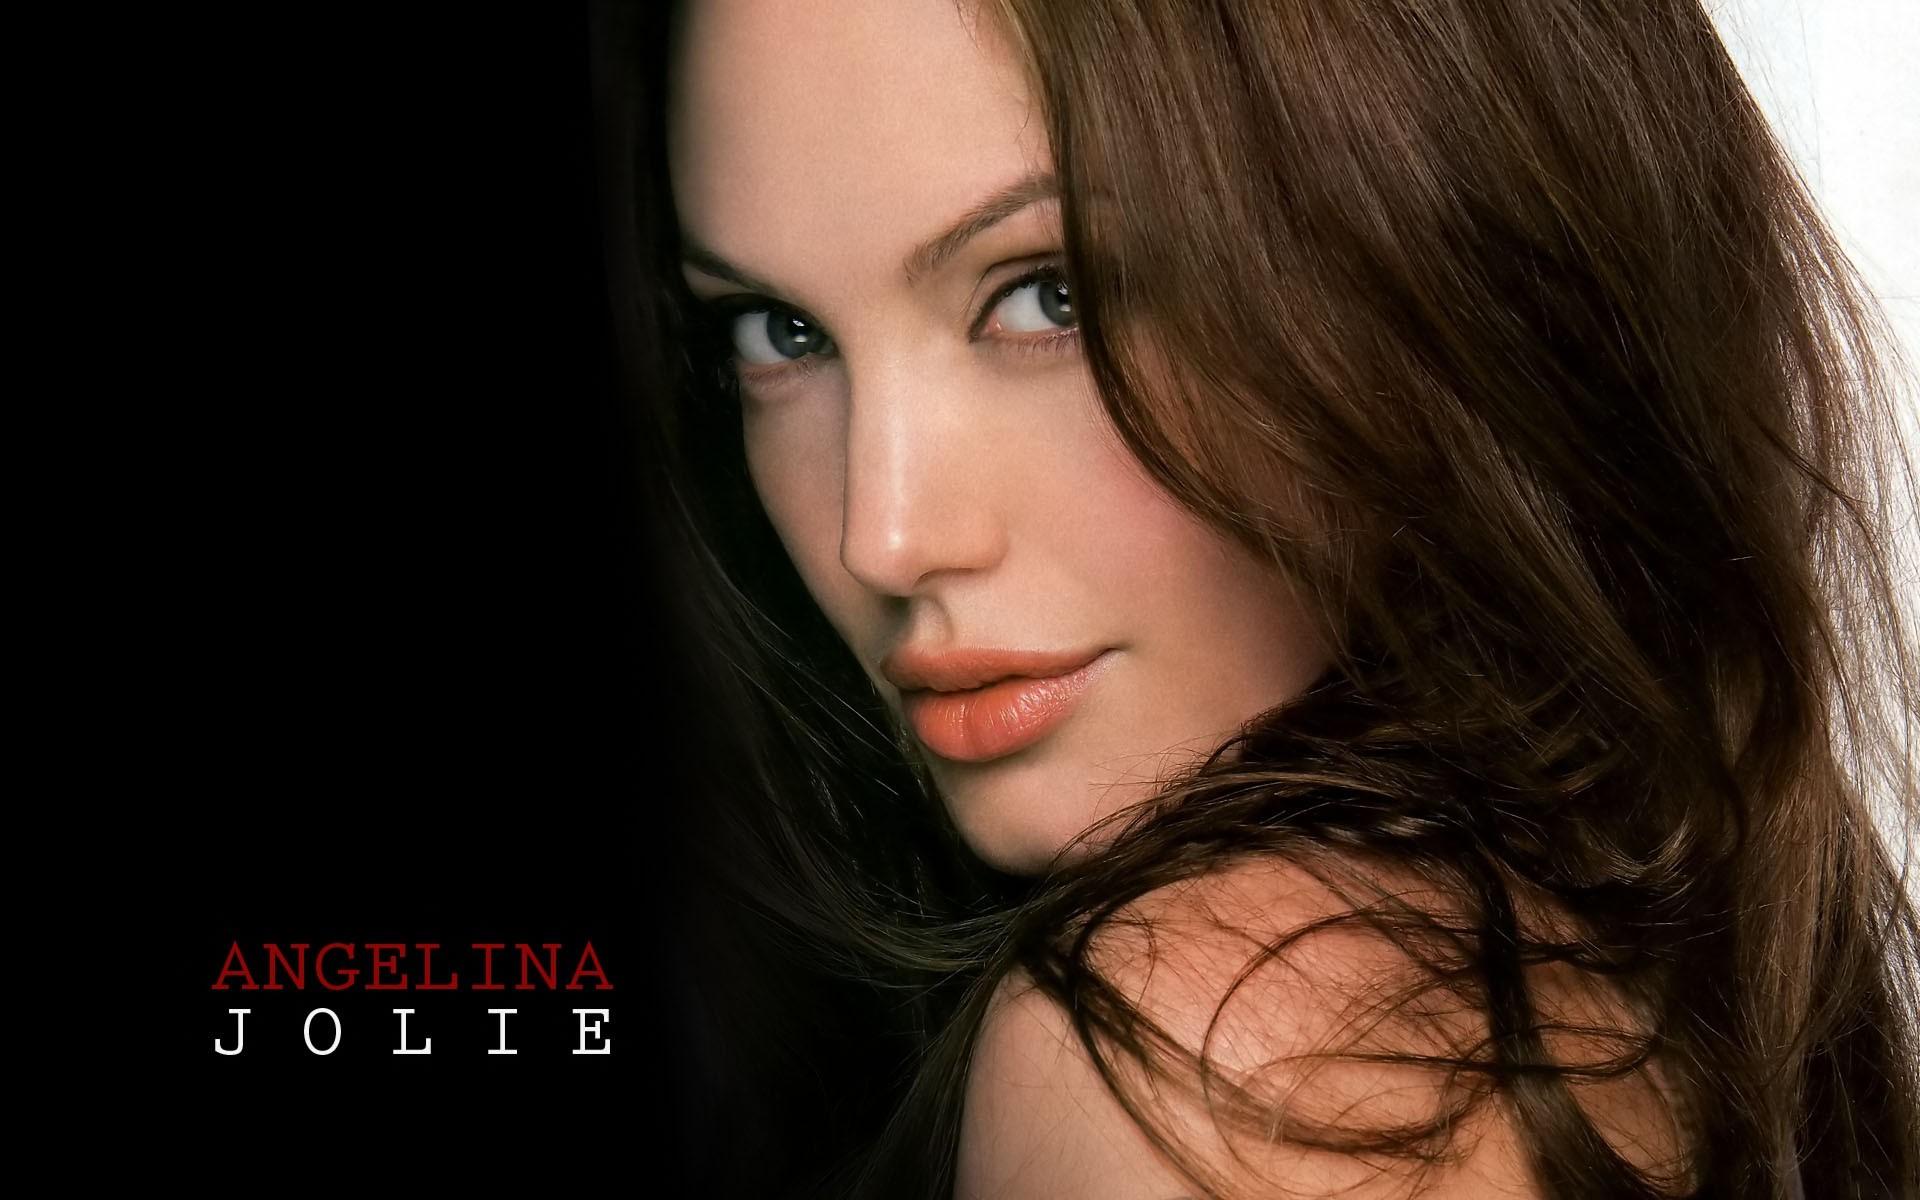 La nueva Angelina Jolie - 1920x1200